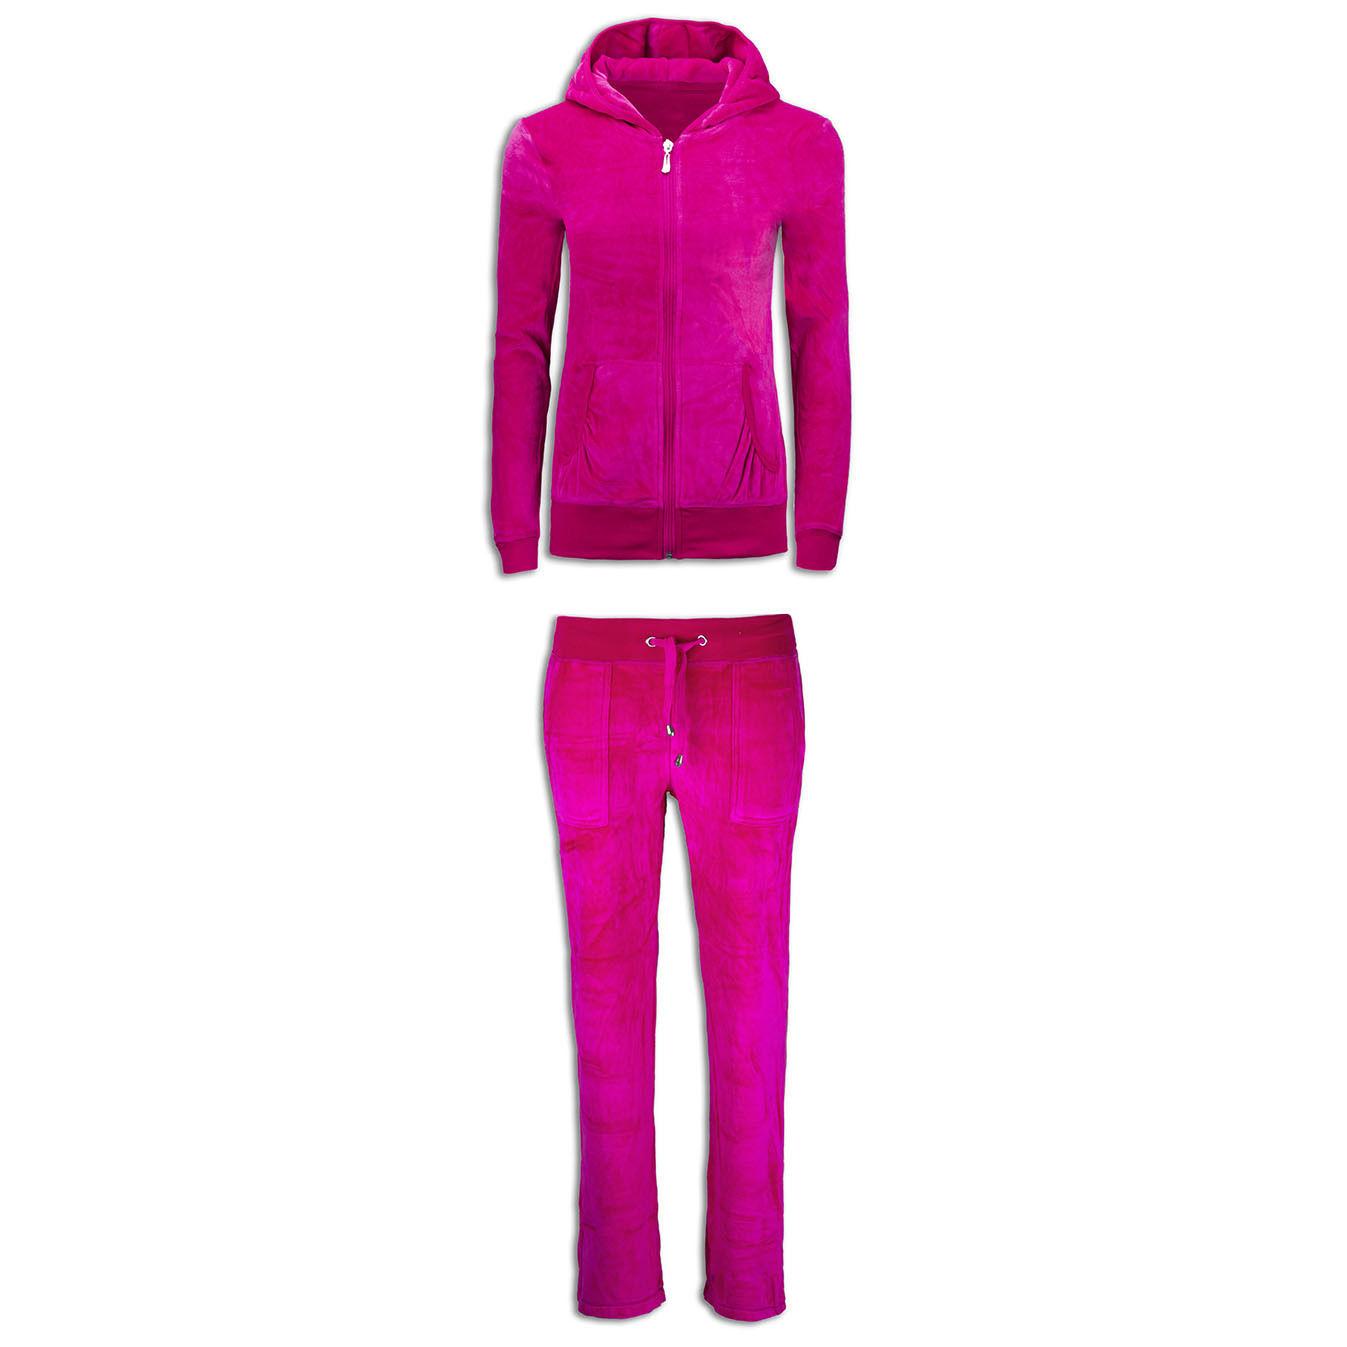 6ed8e3b11 Wholesale Fitted Sweatsuit Custom Men Sport Hoodie Jogging Pullover Zipper  Cotton fashion design ladies pink tracksuit